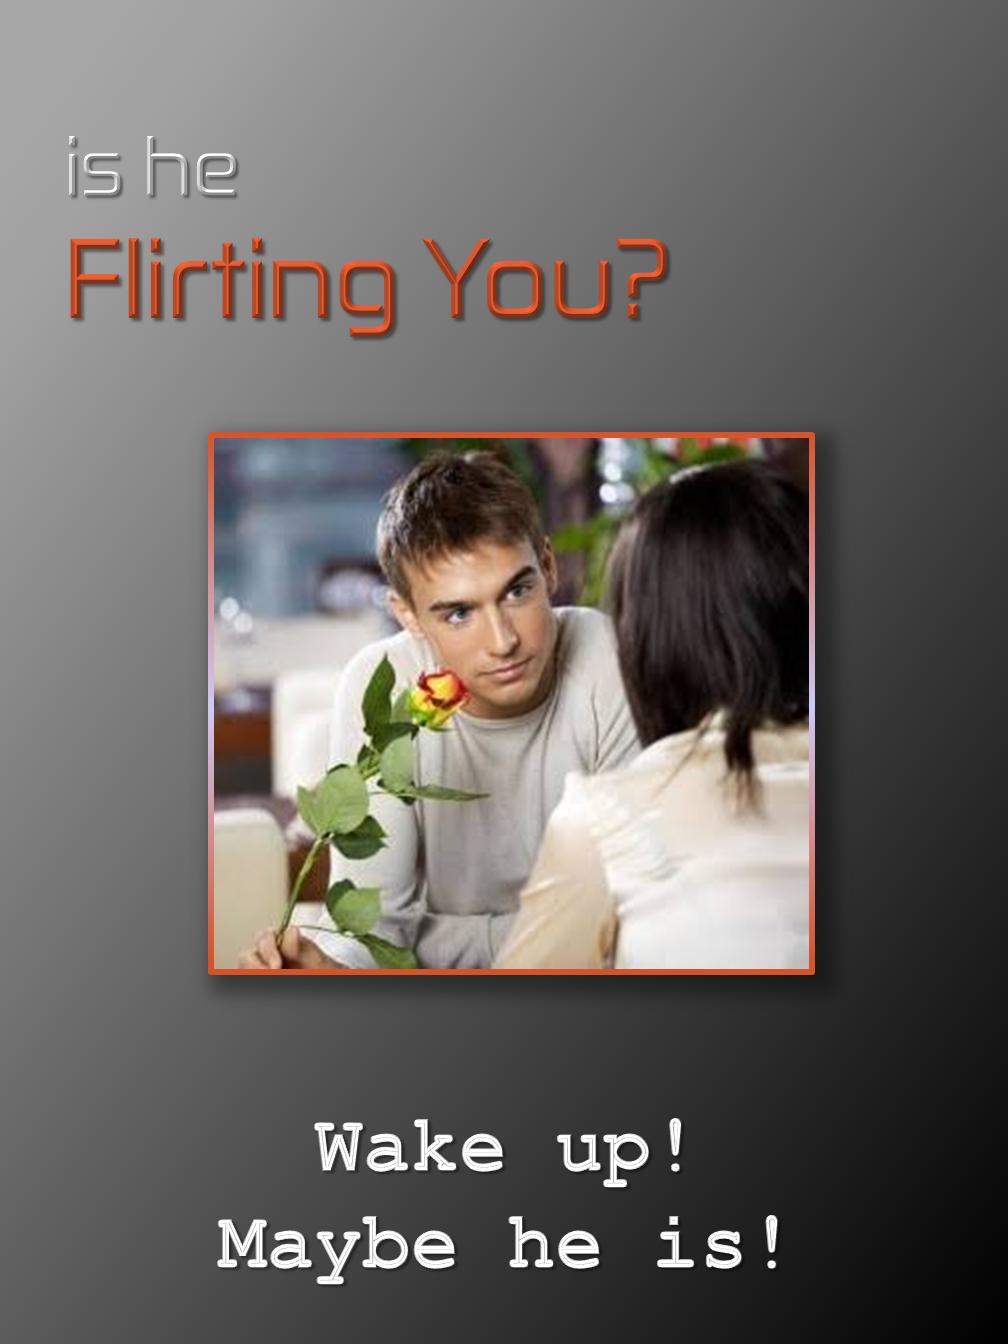 Flirting?